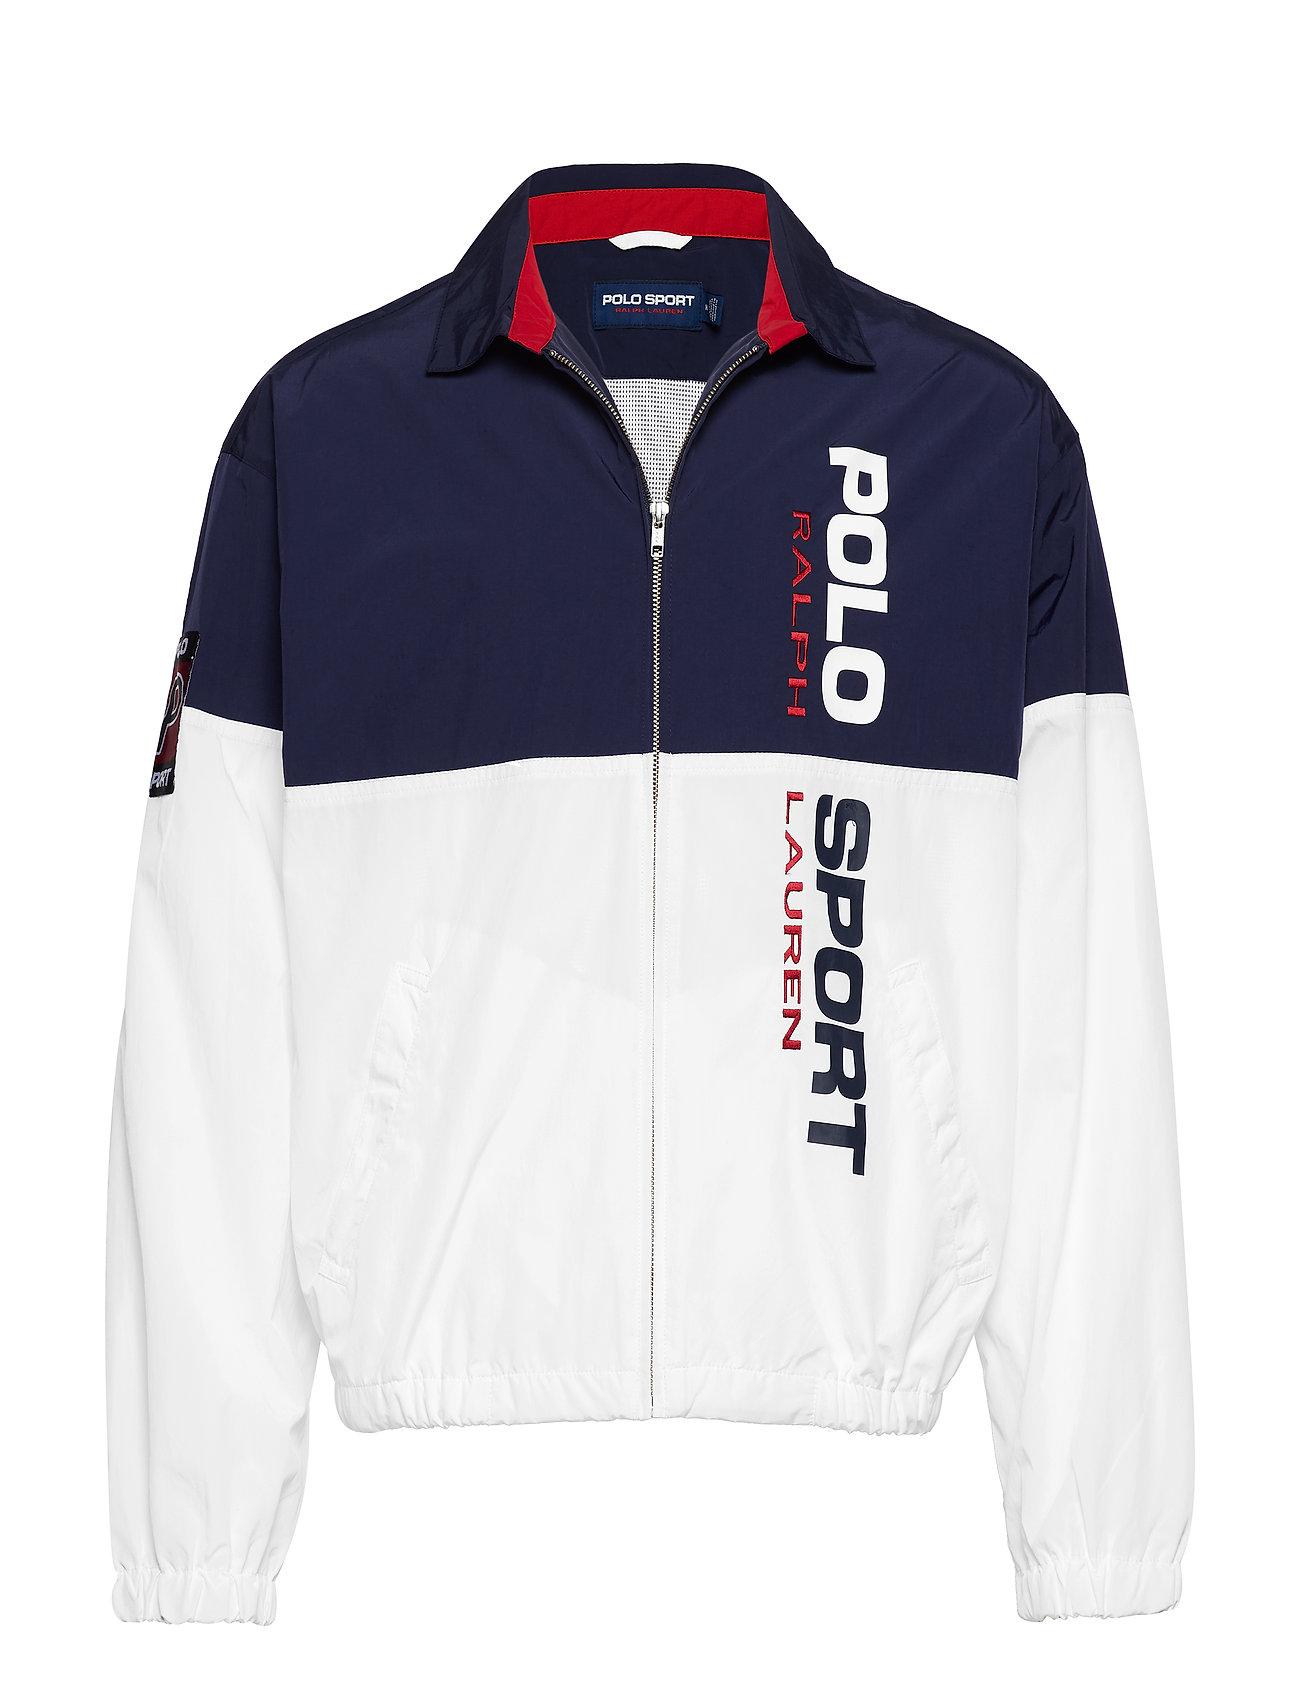 Polo Ralph Lauren Polo Sport Windbreaker - CRUISE NAVY/ PURE